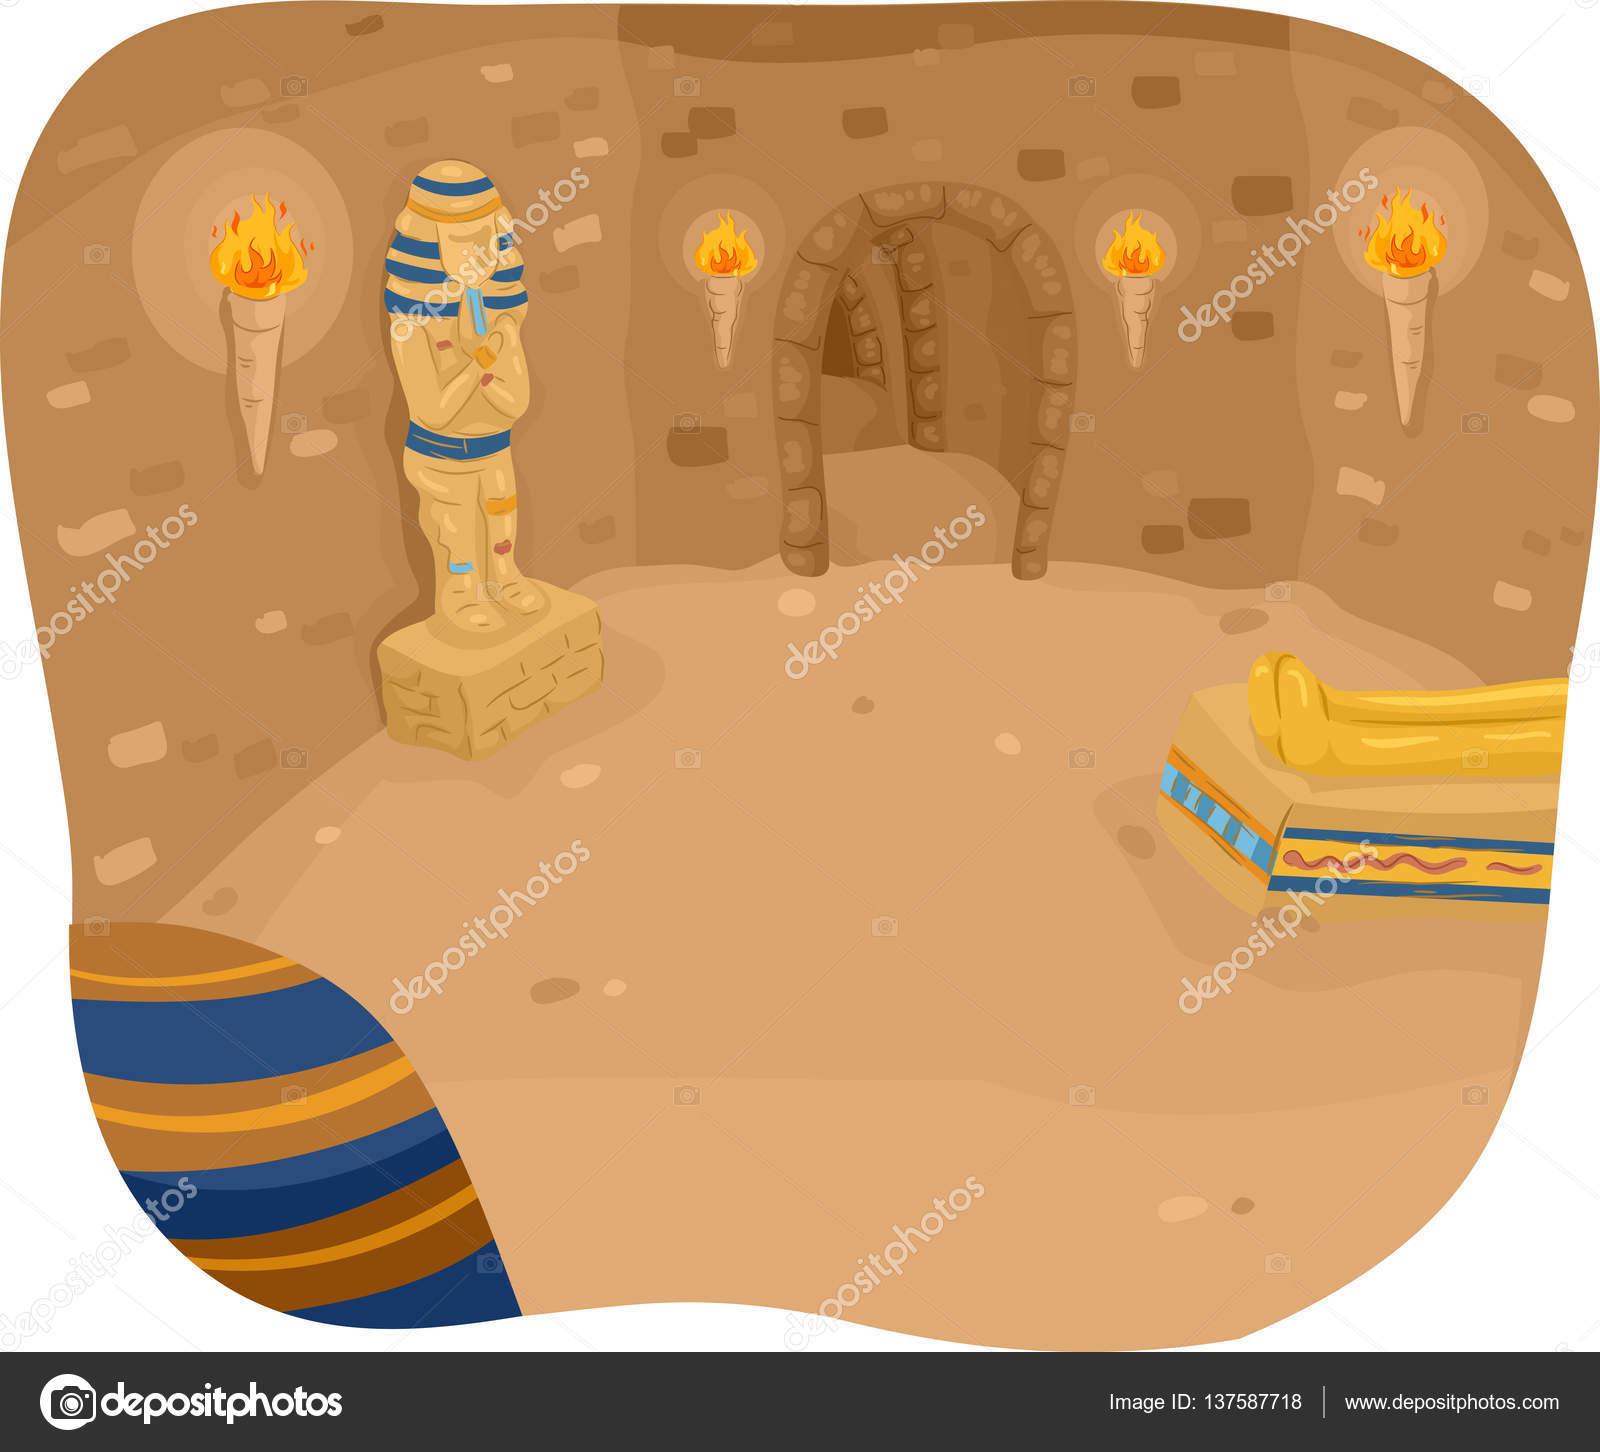 Ägyptische Pyramiden-Interieur — Stockfoto © lenmdp #137587718